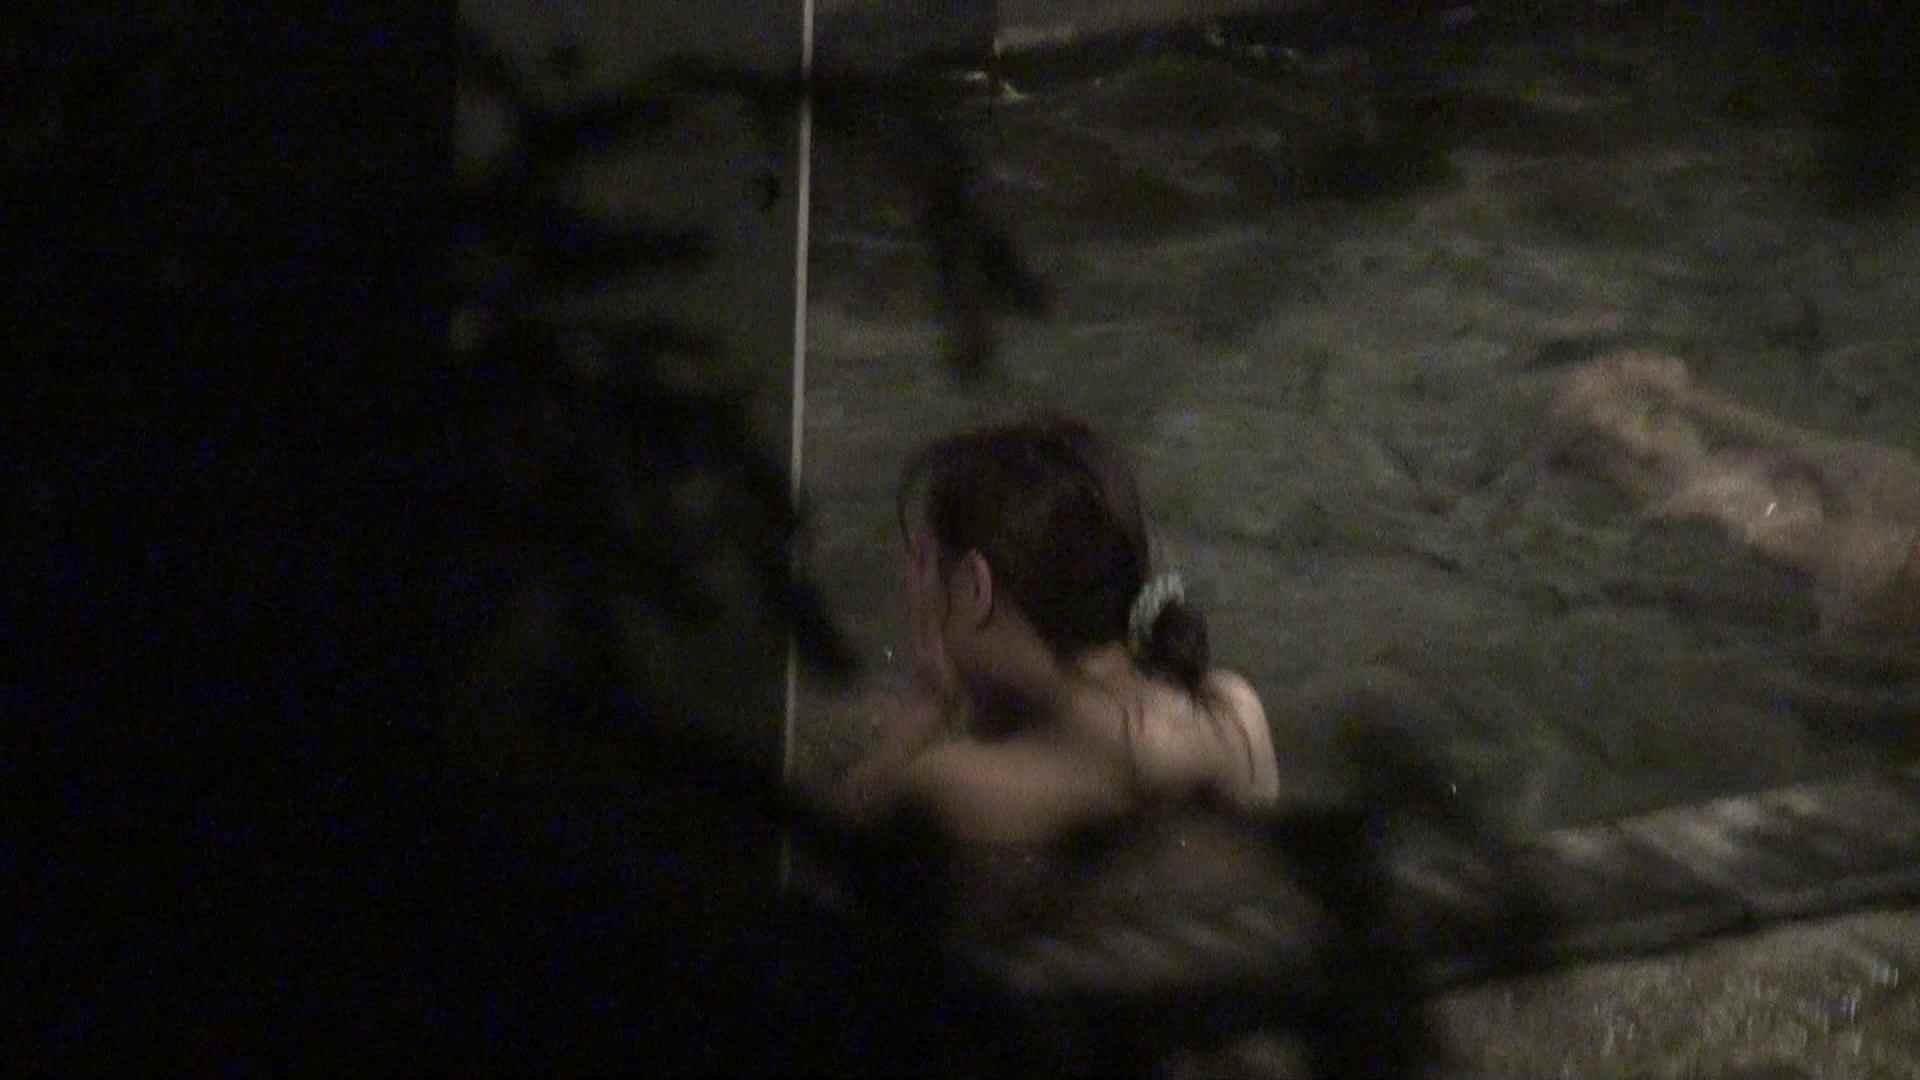 Aquaな露天風呂Vol.438 0 | 0  65連発 17